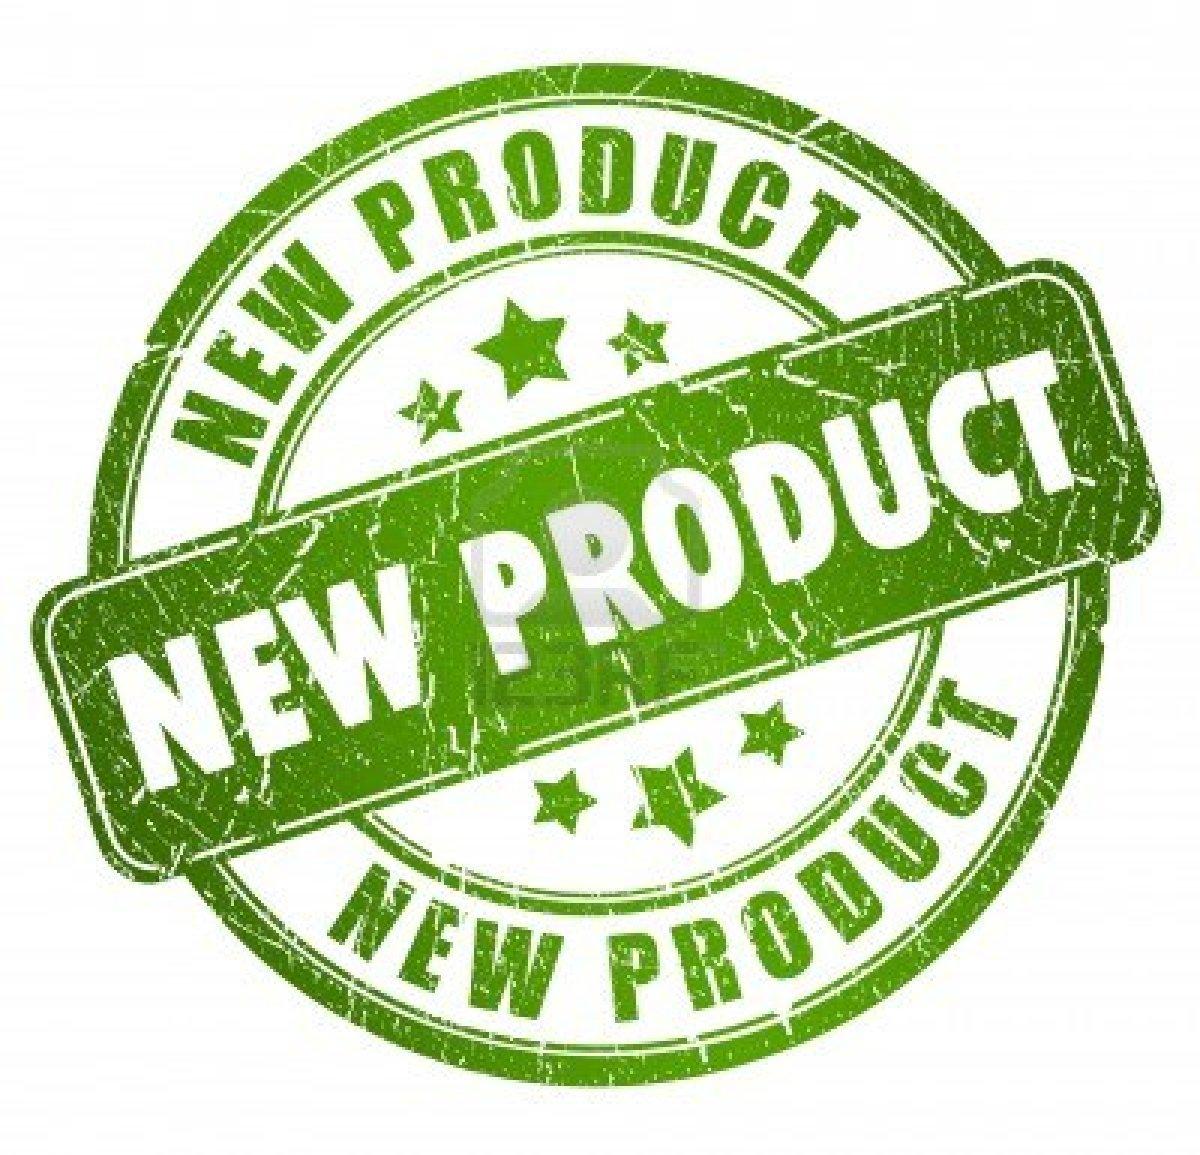 steps effective introduction of the product vskills blog